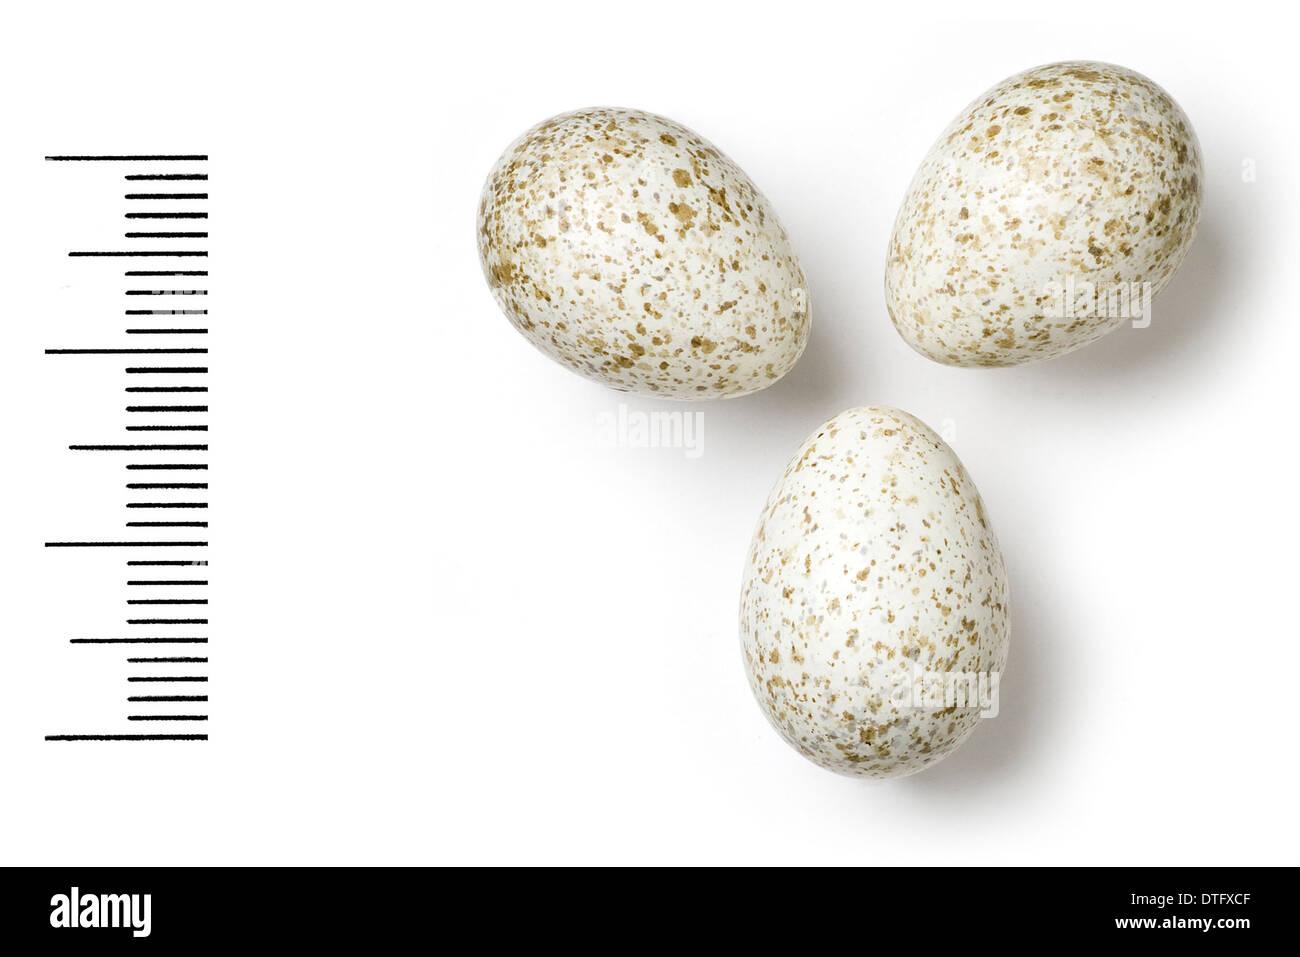 Calandrella raytal, indian short-toed lark - Stock Image